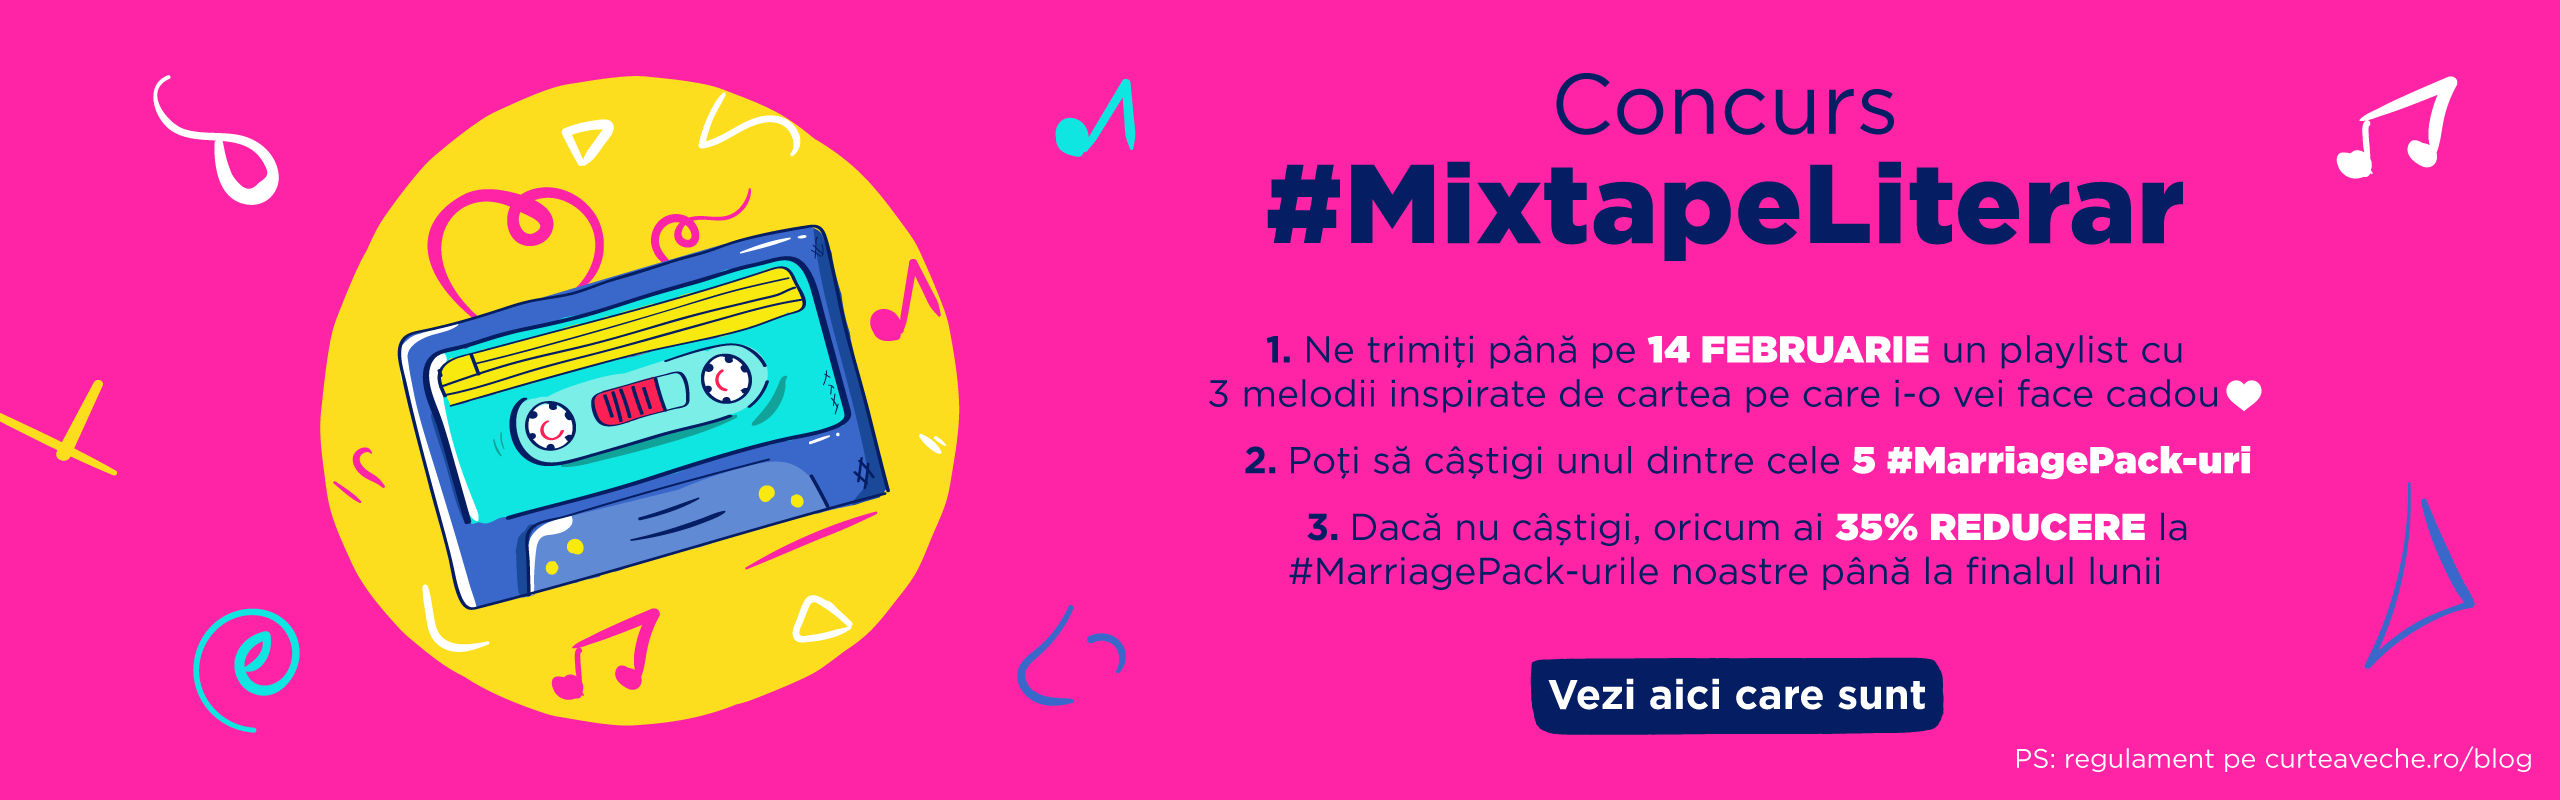 CONCURS: Cucerește-ti perechea cu un #MixtapeLiterar!